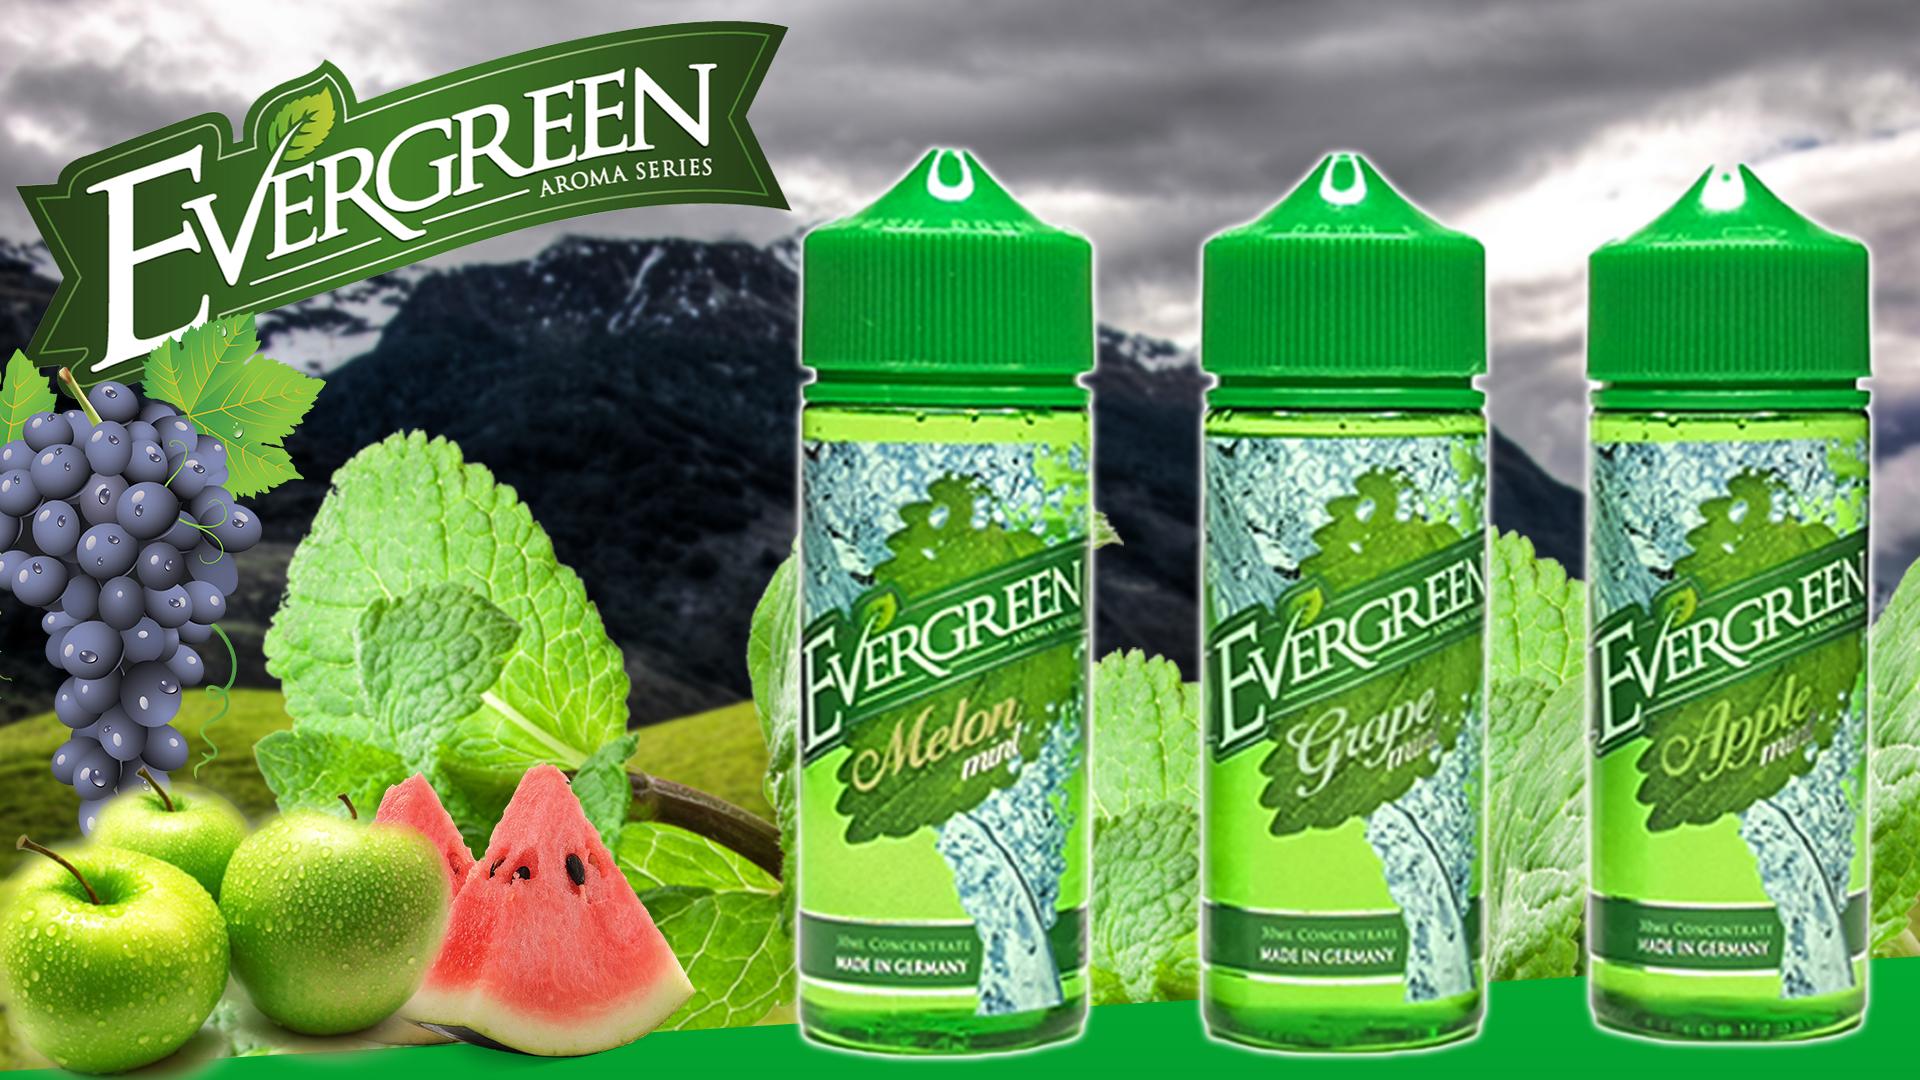 evergreenGfzkfC0NU8pSs